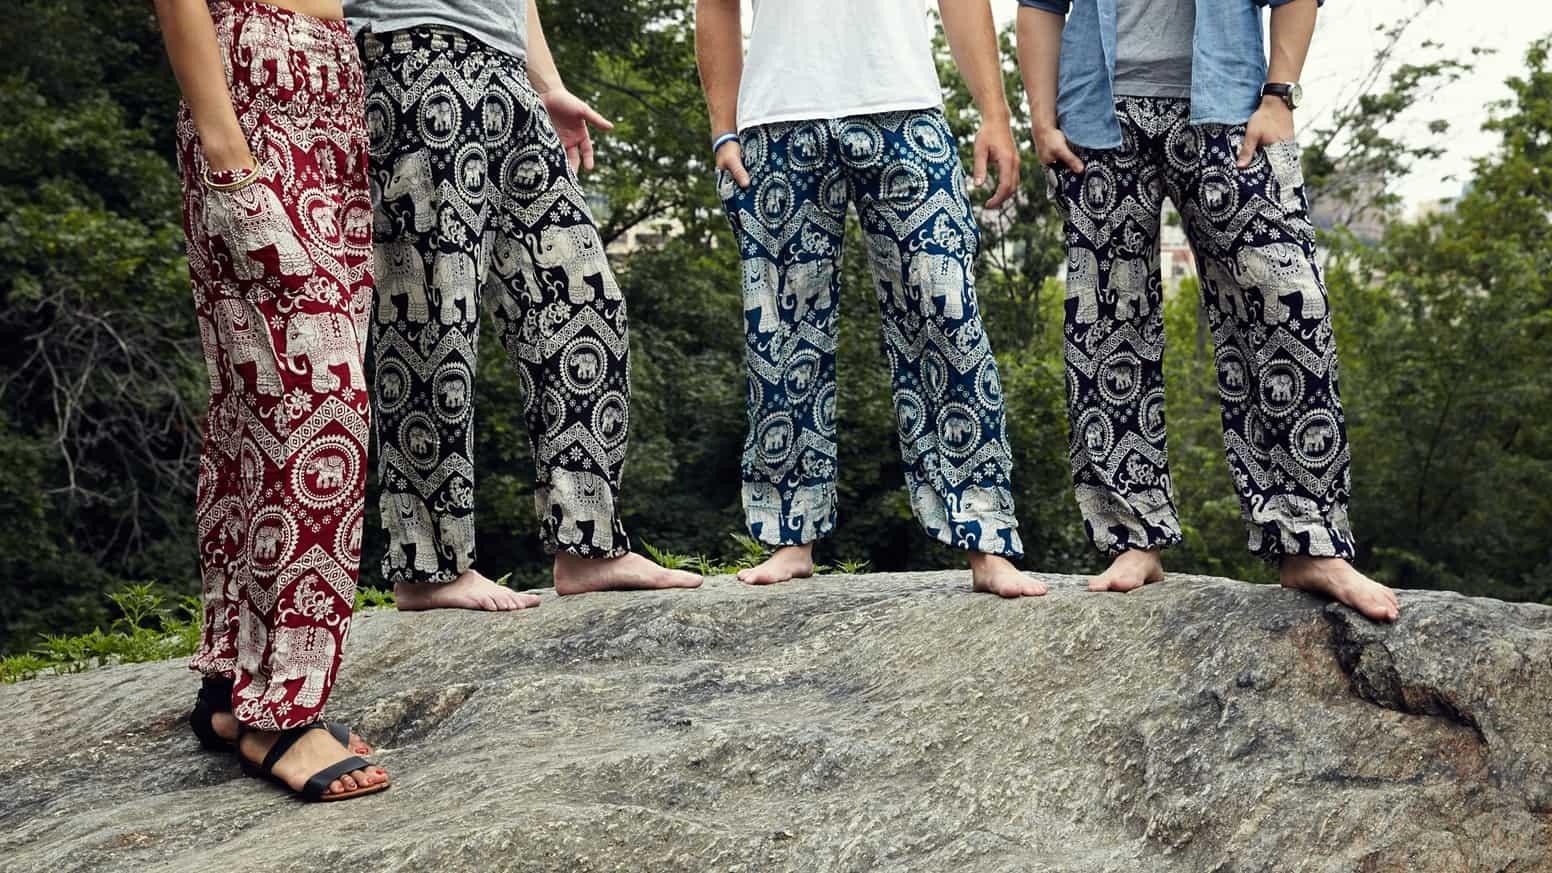 pantalones de elefante souvenir regalo